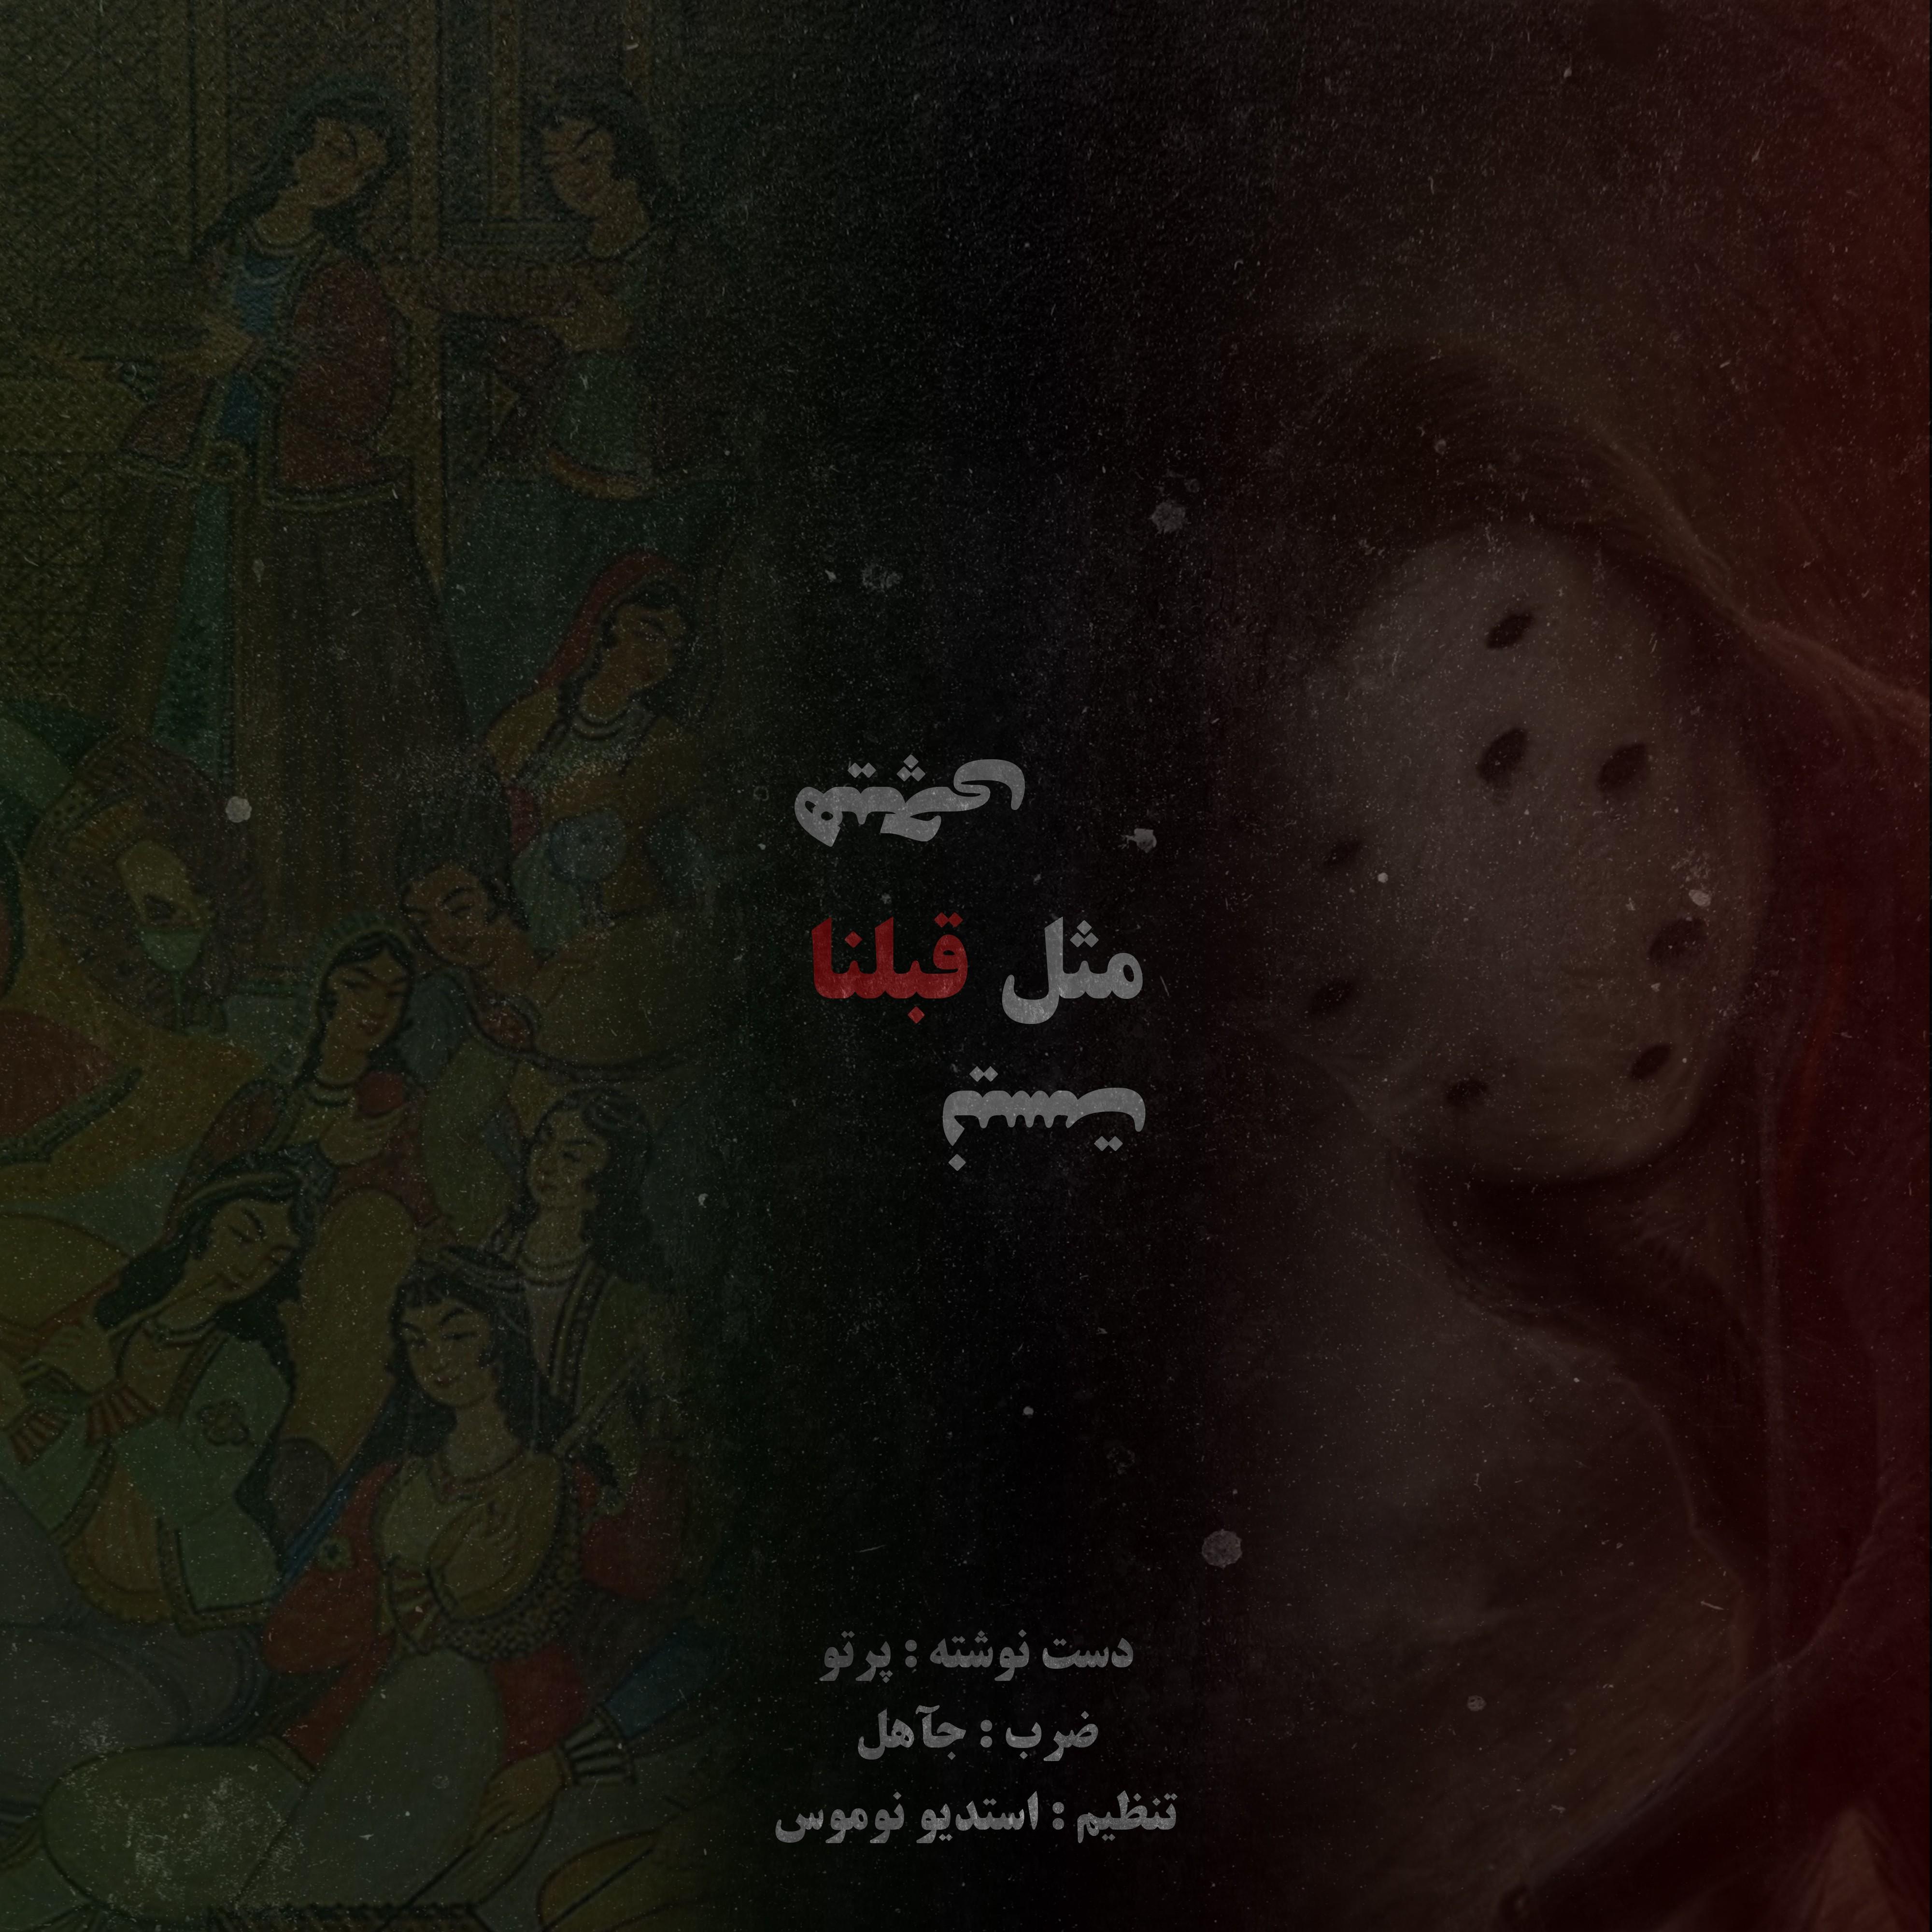 Saeid Parto – Hichi Mesle Ghablana Nist